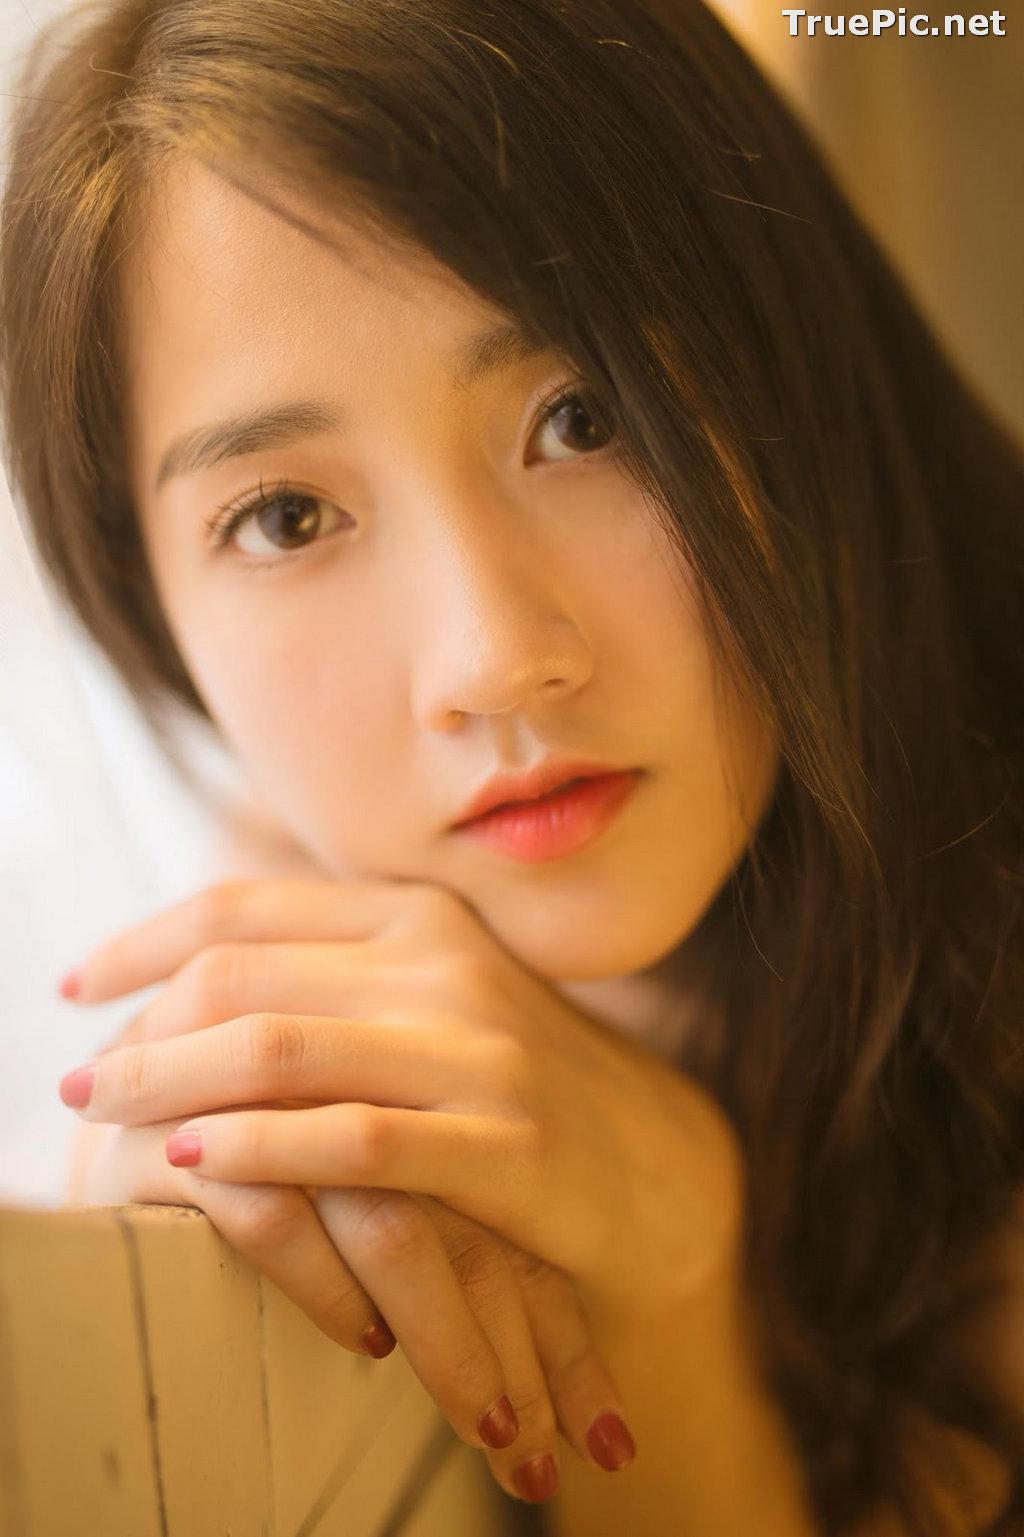 Image Vietnamese Hot Girl - Nguyen Hoang Kieu Trinh - My Black Angel - TruePic.net - Picture-1